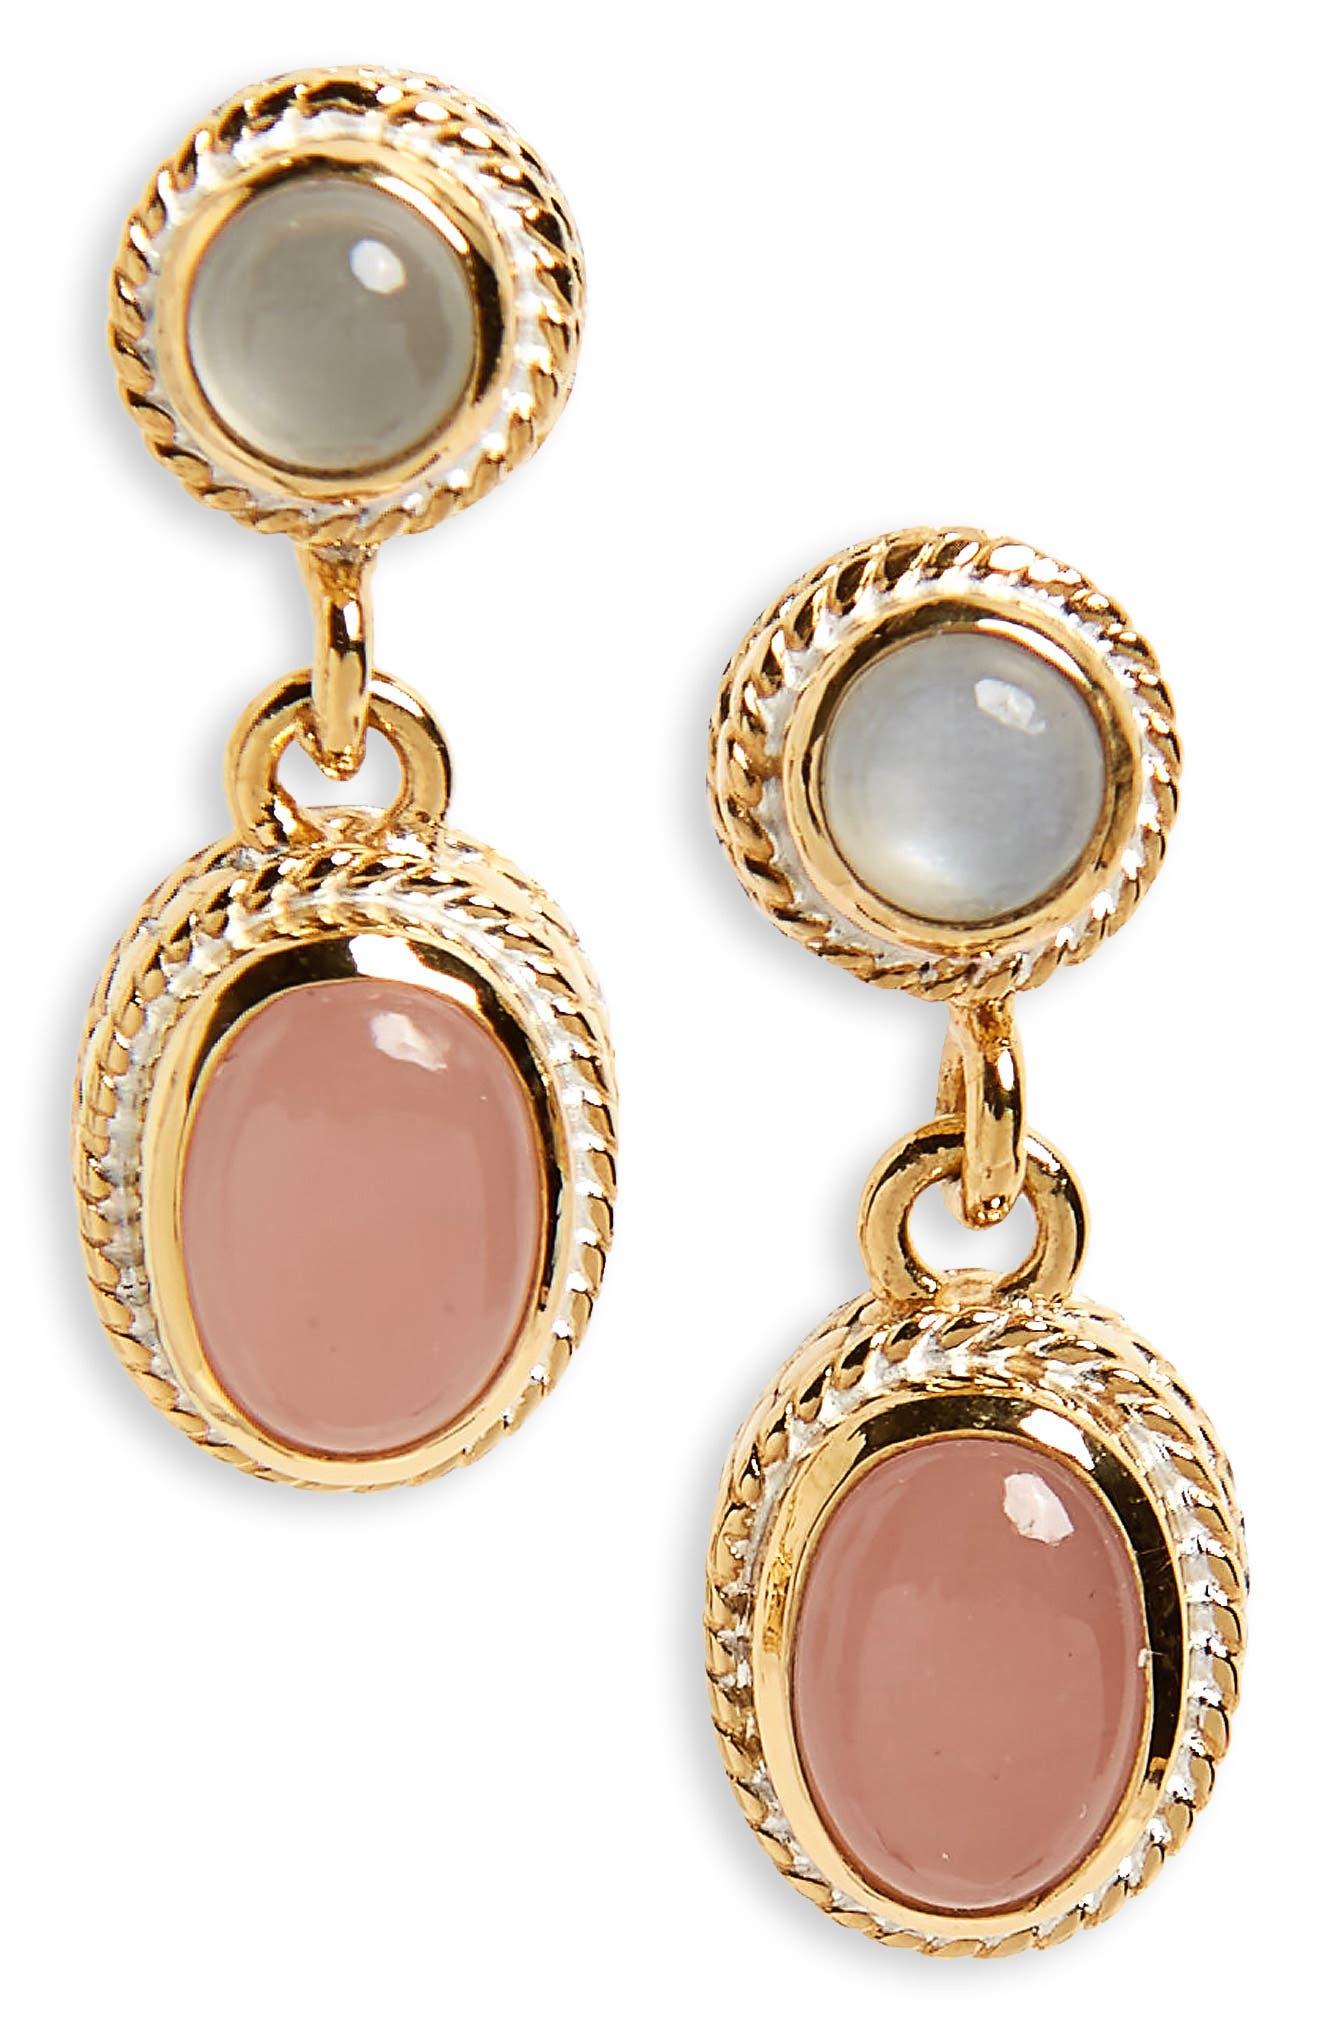 Double Drop Pearl Earrings,                         Main,                         color, Gold/ Guava Quartz/ Moonstone